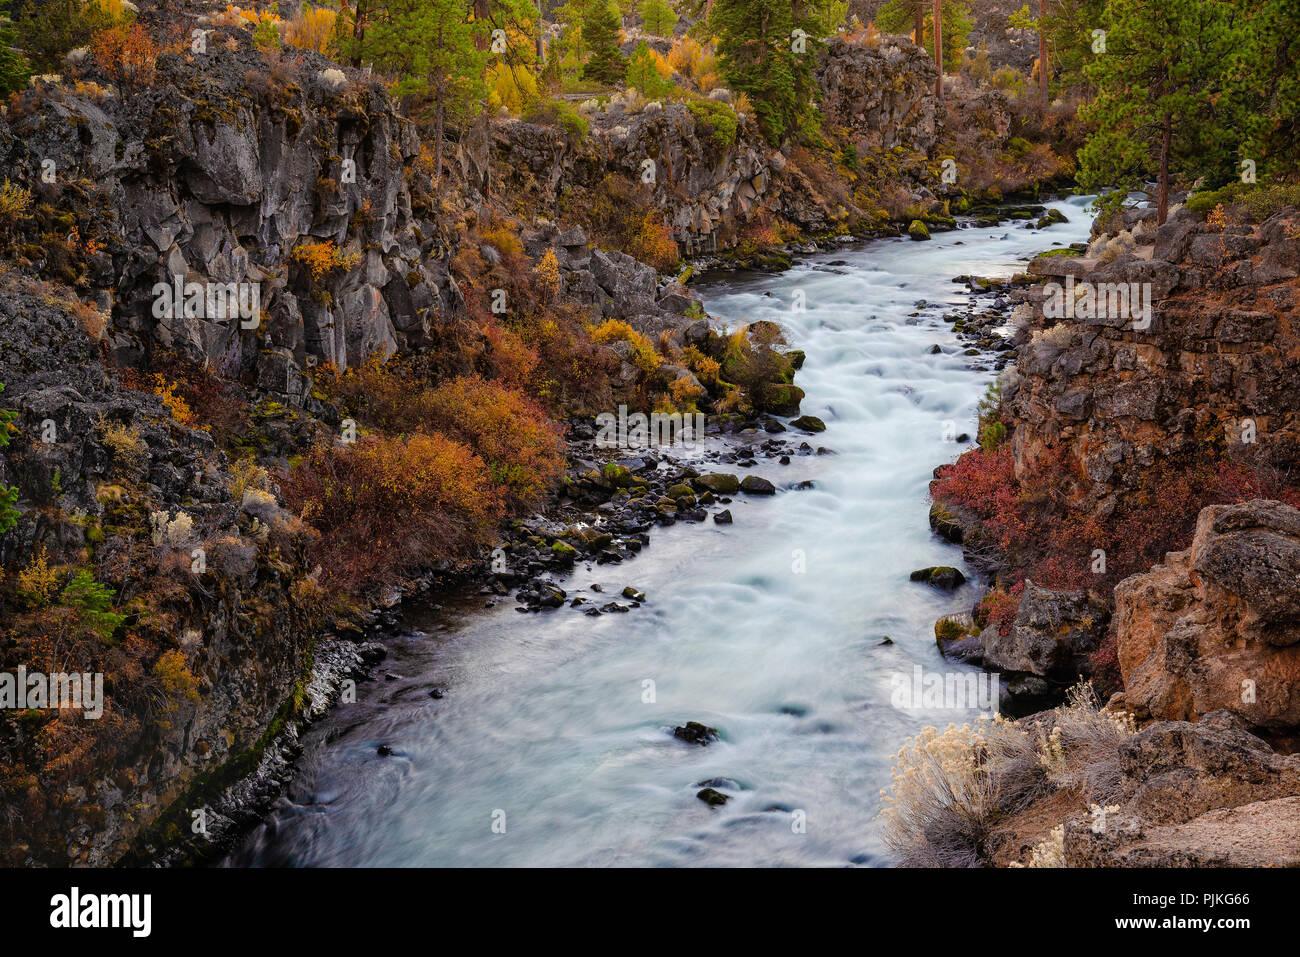 Dillon Falls on the Deschutes River; Deschutes National Forest, central Oregon. - Stock Image